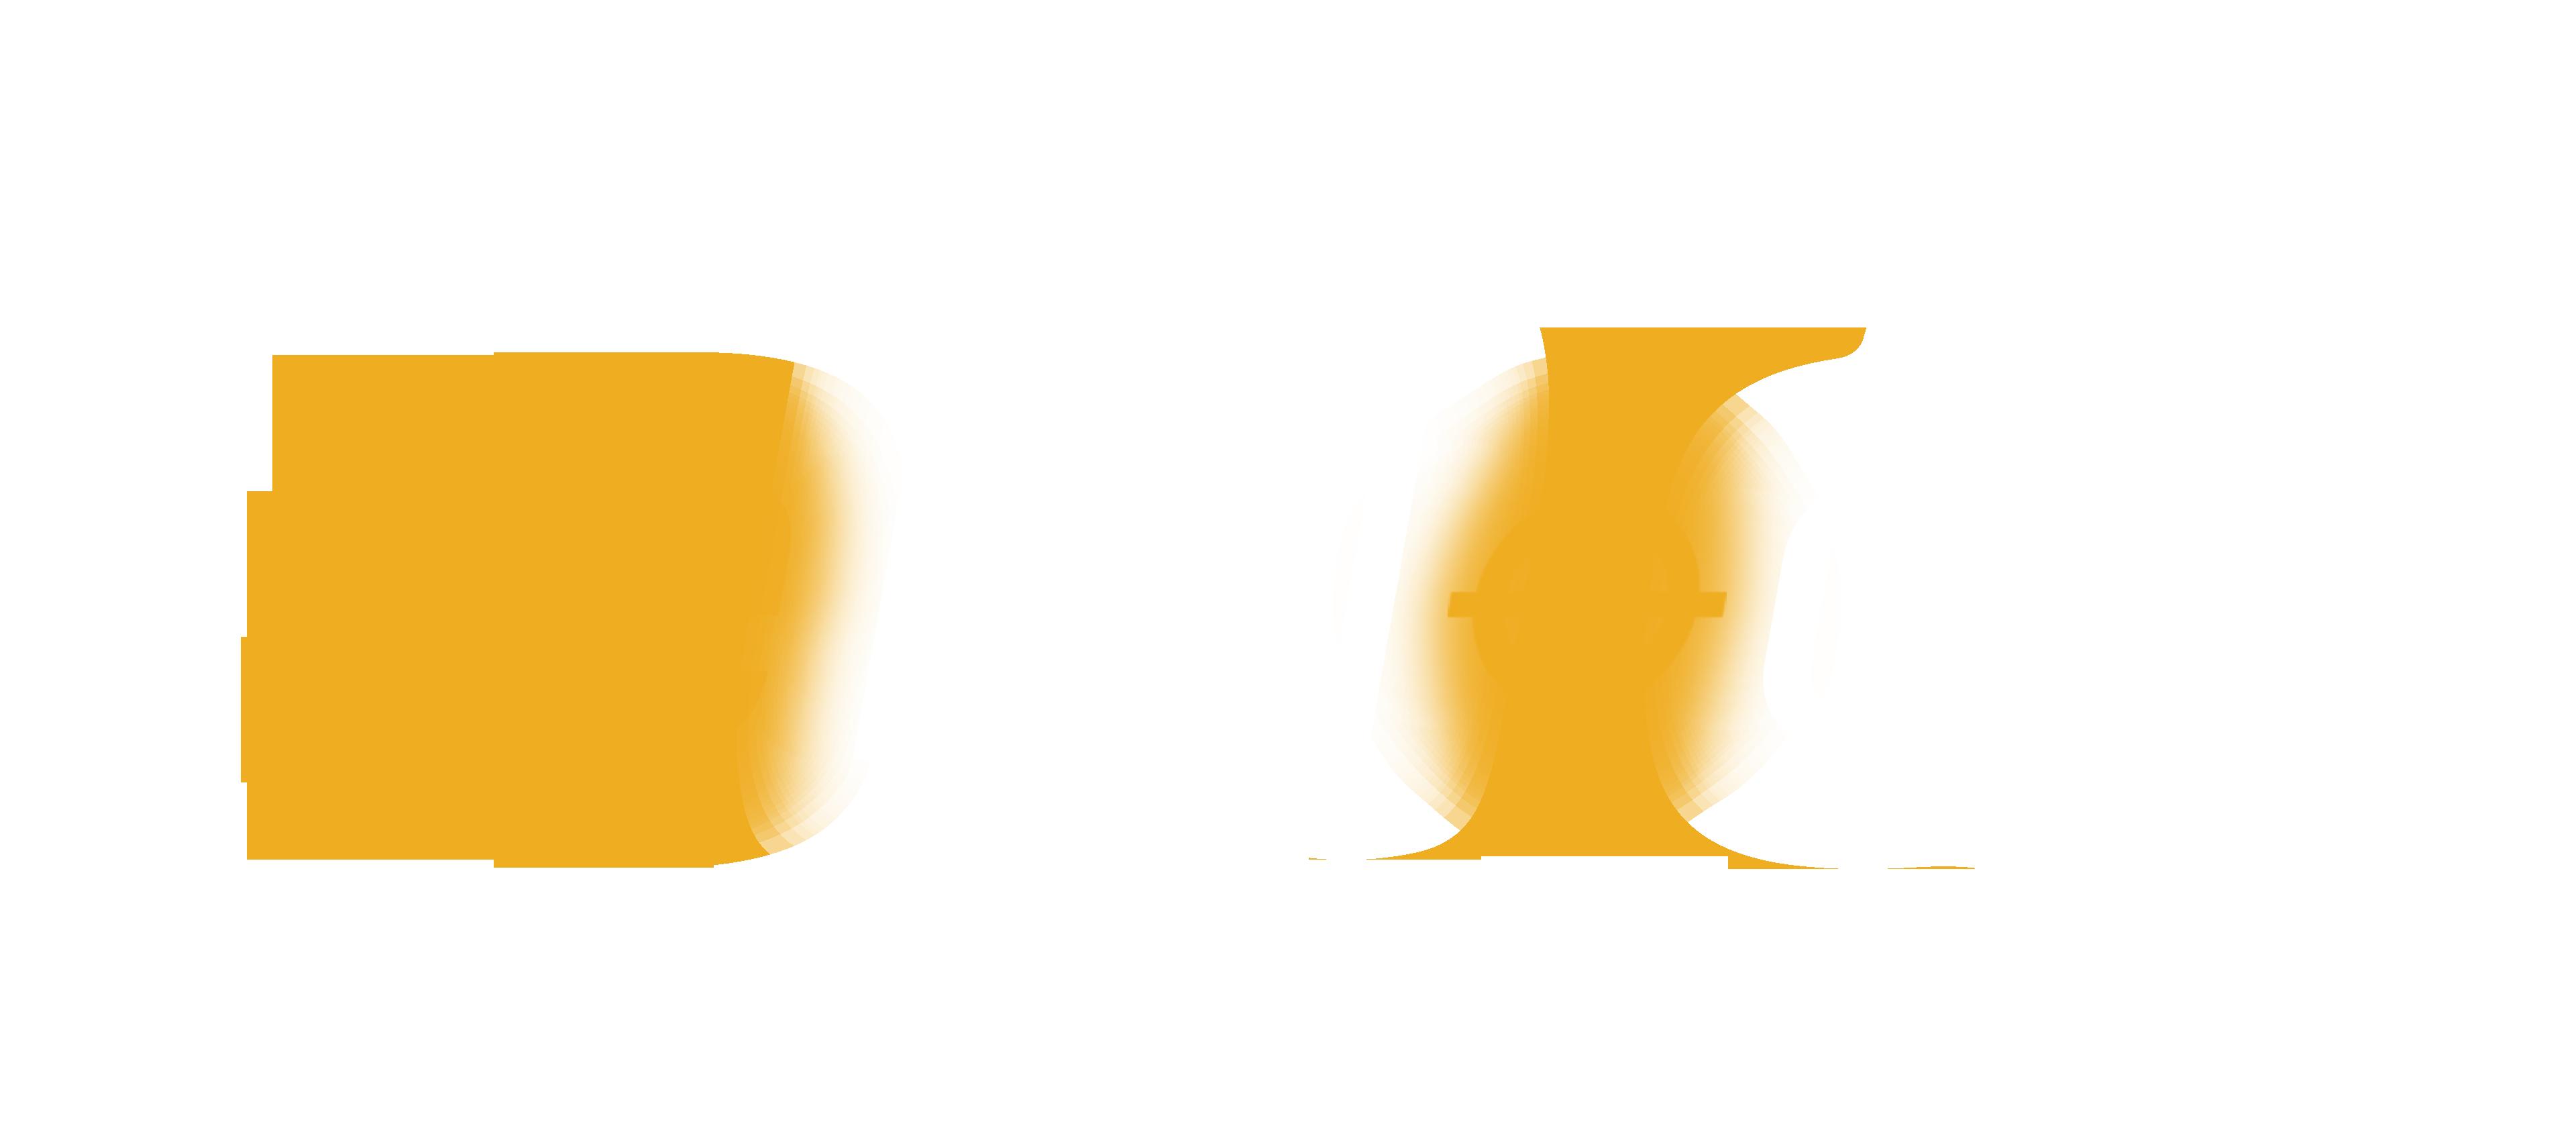 re[Mod]